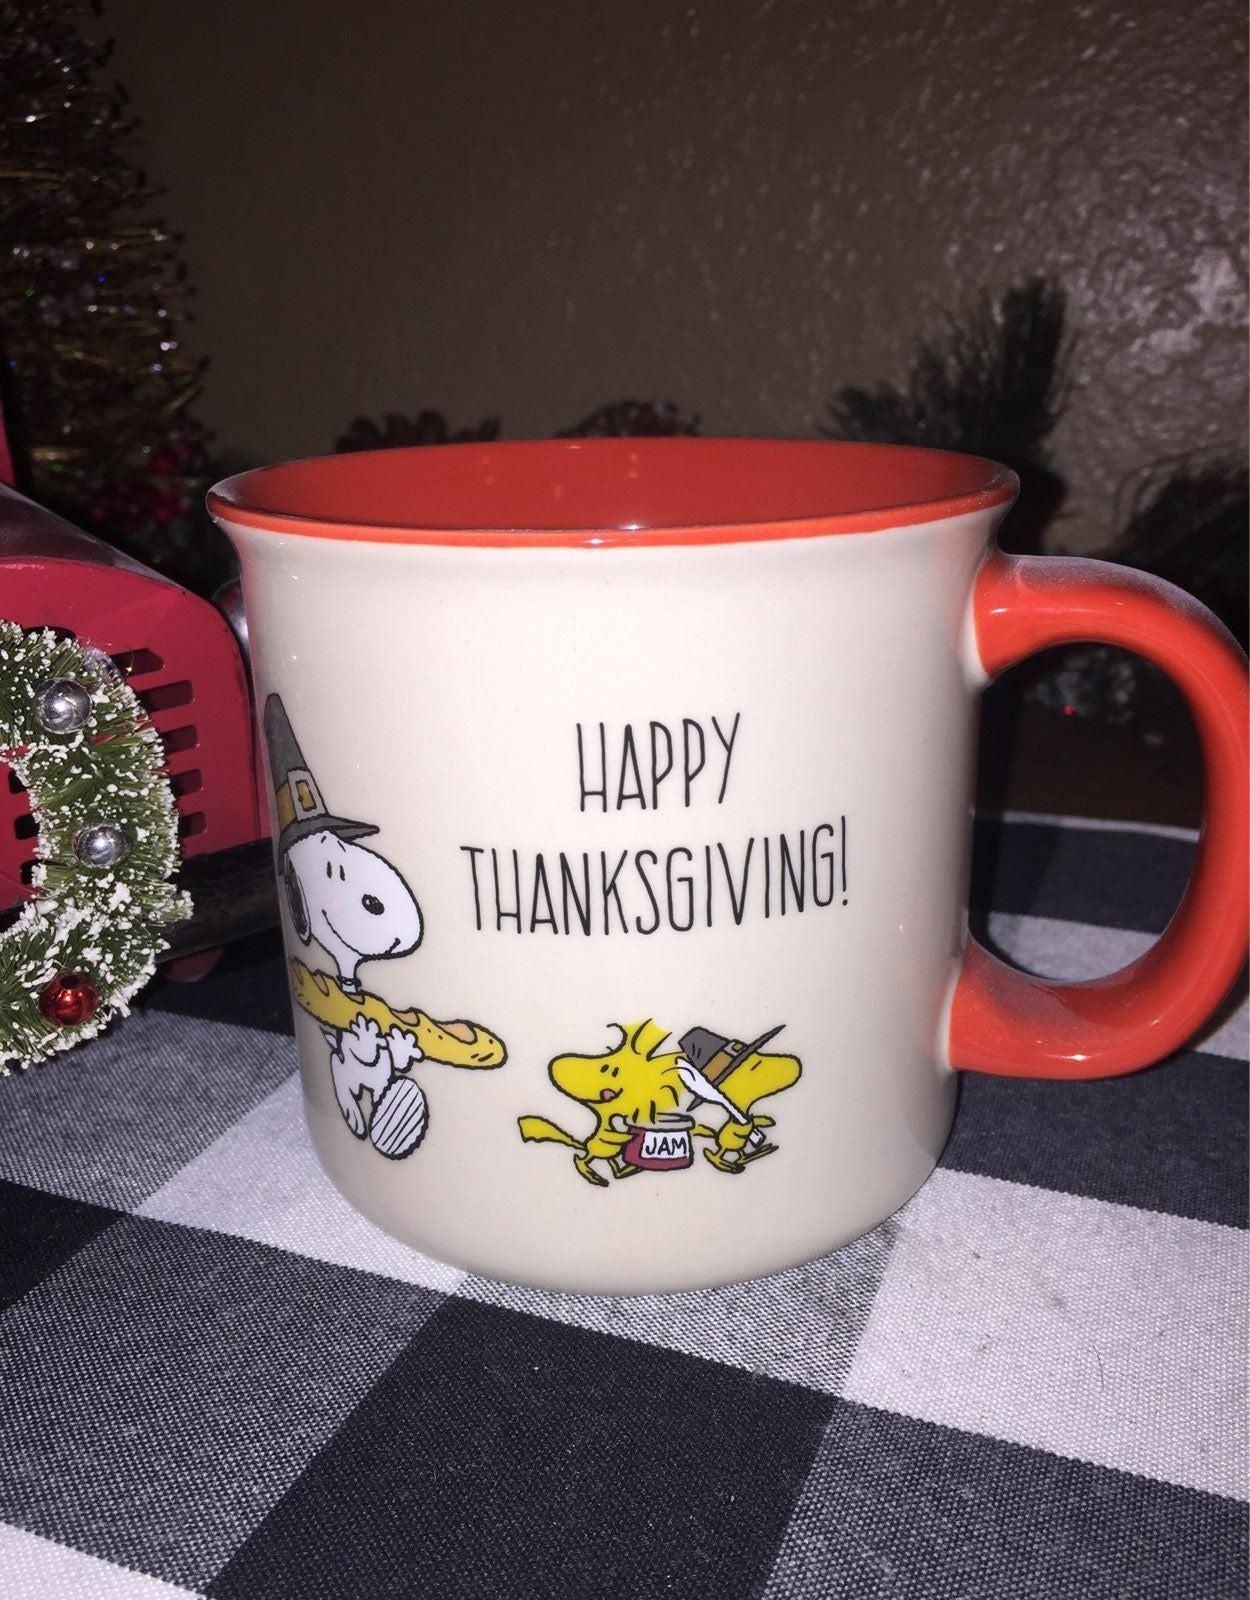 Peanuts Snoopy Happy Thanksgiving